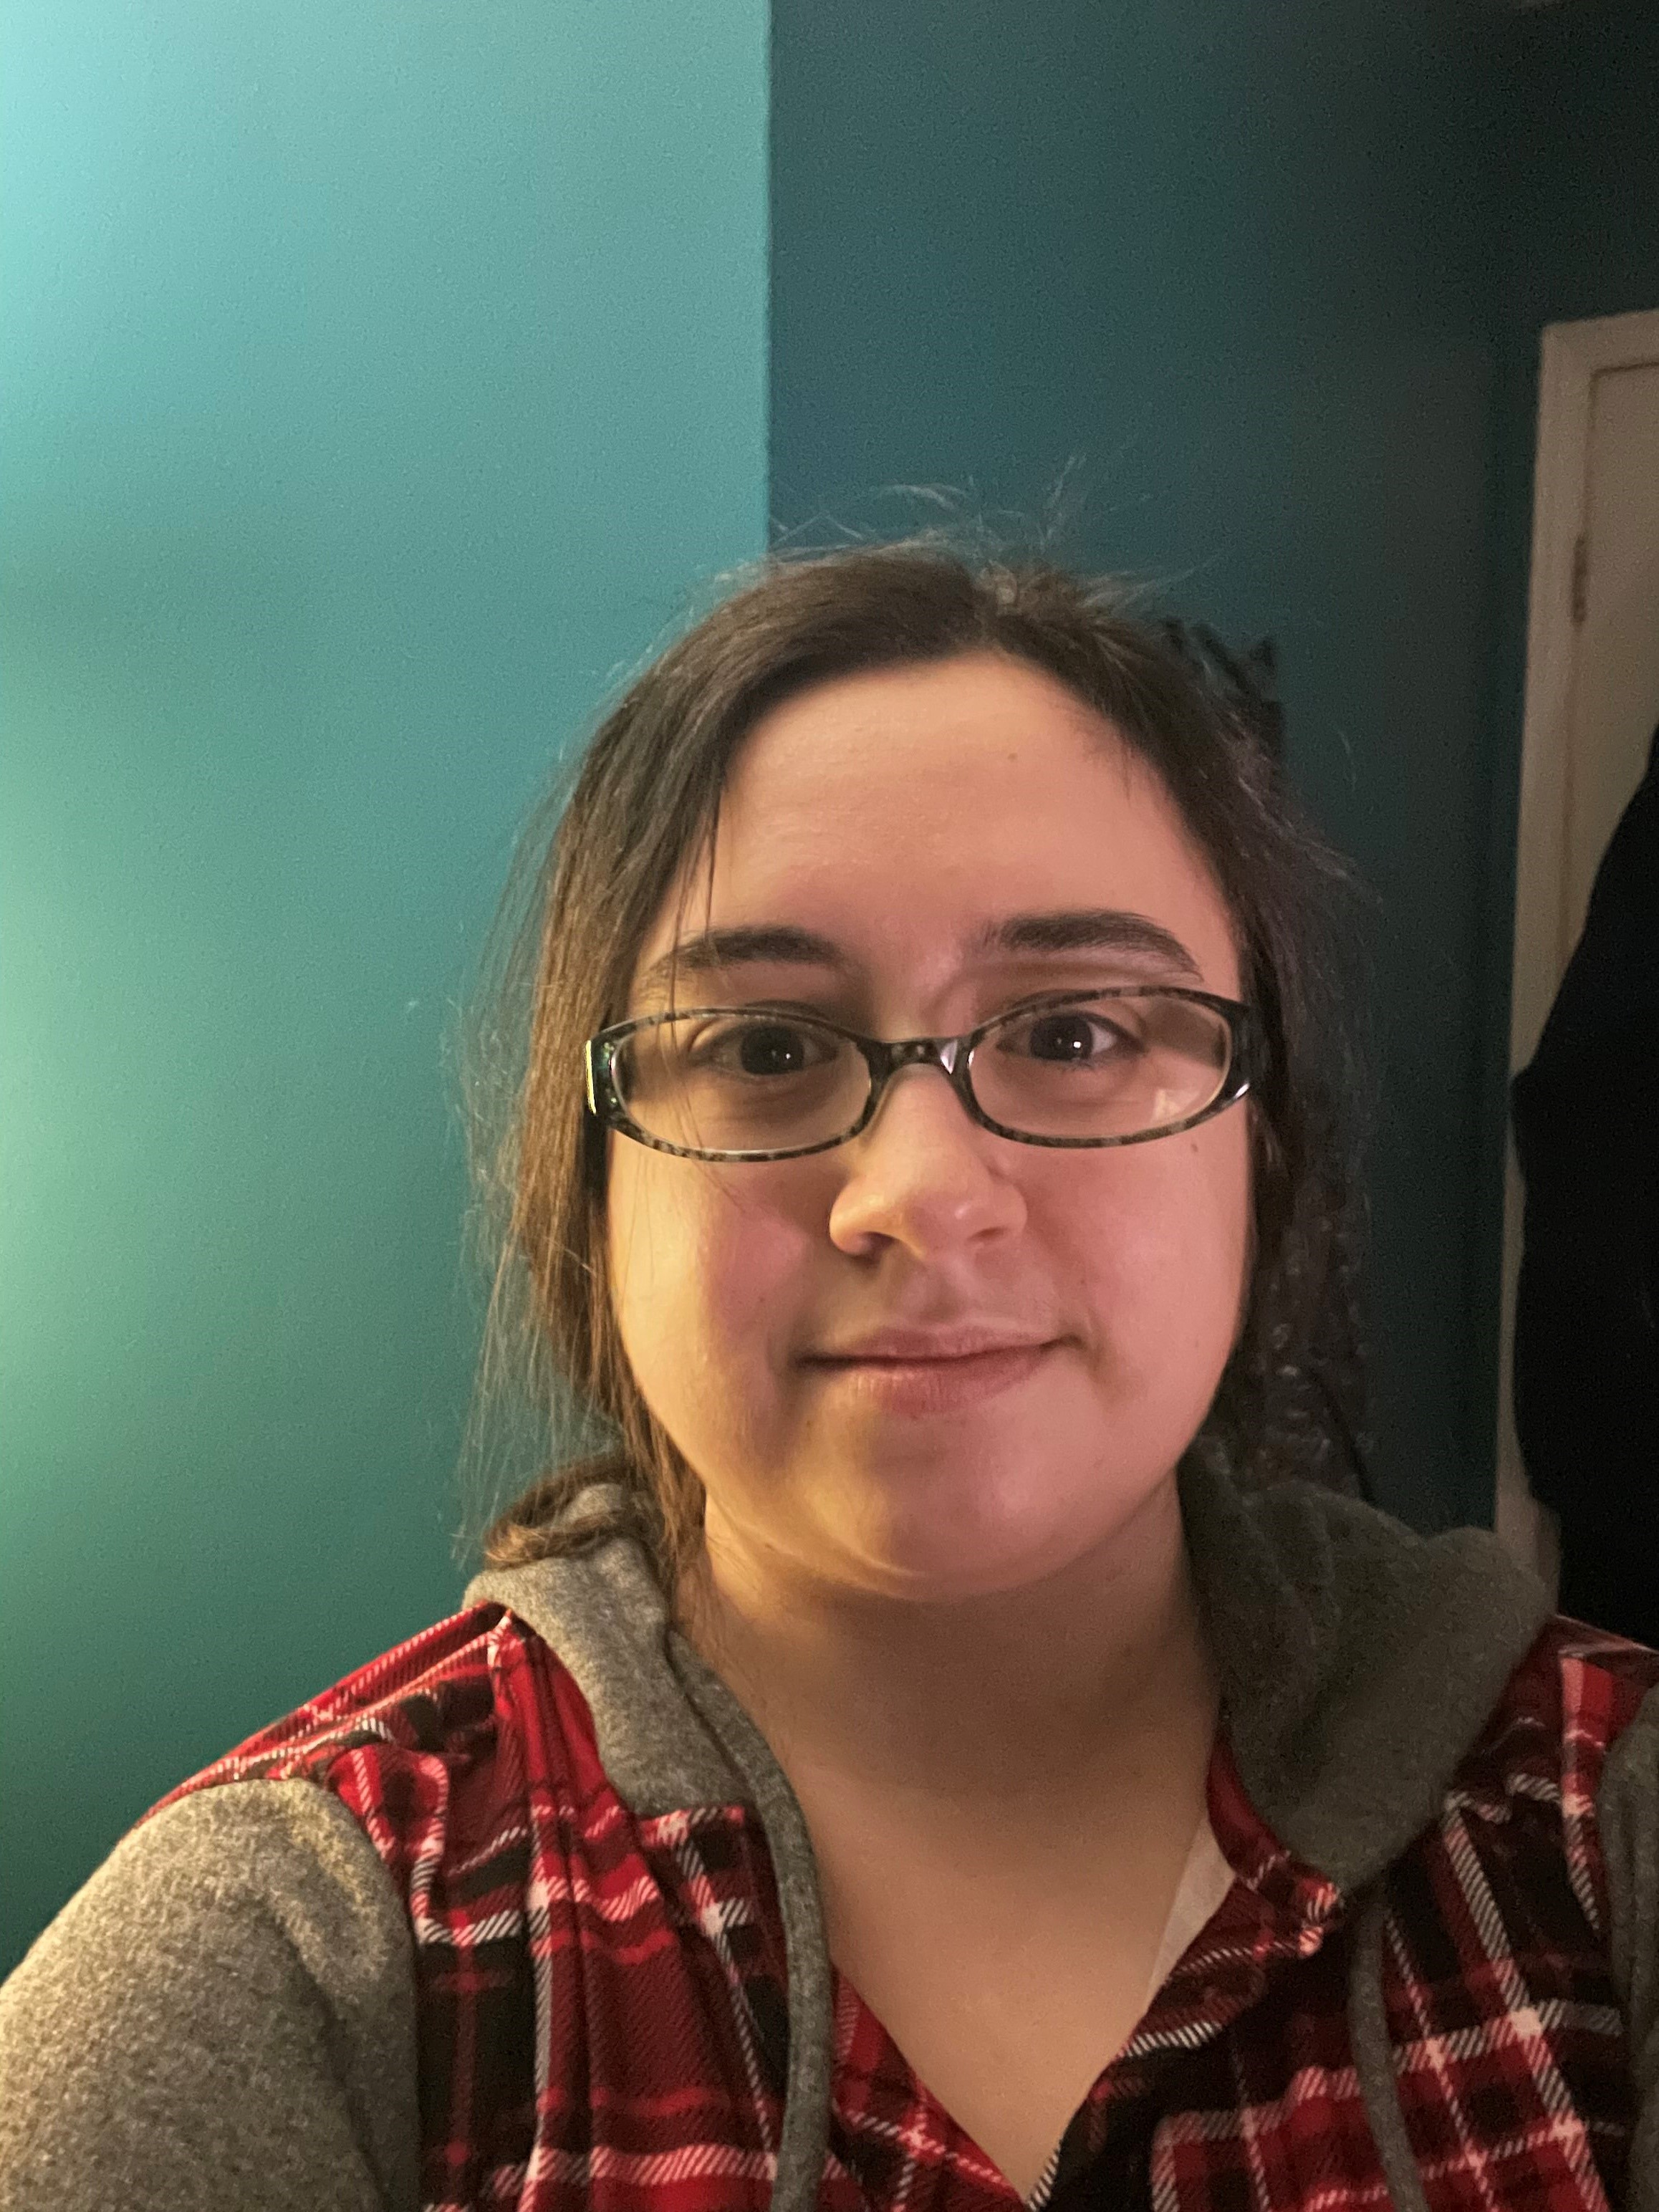 Picture of Heather Stephen, GDES grad.